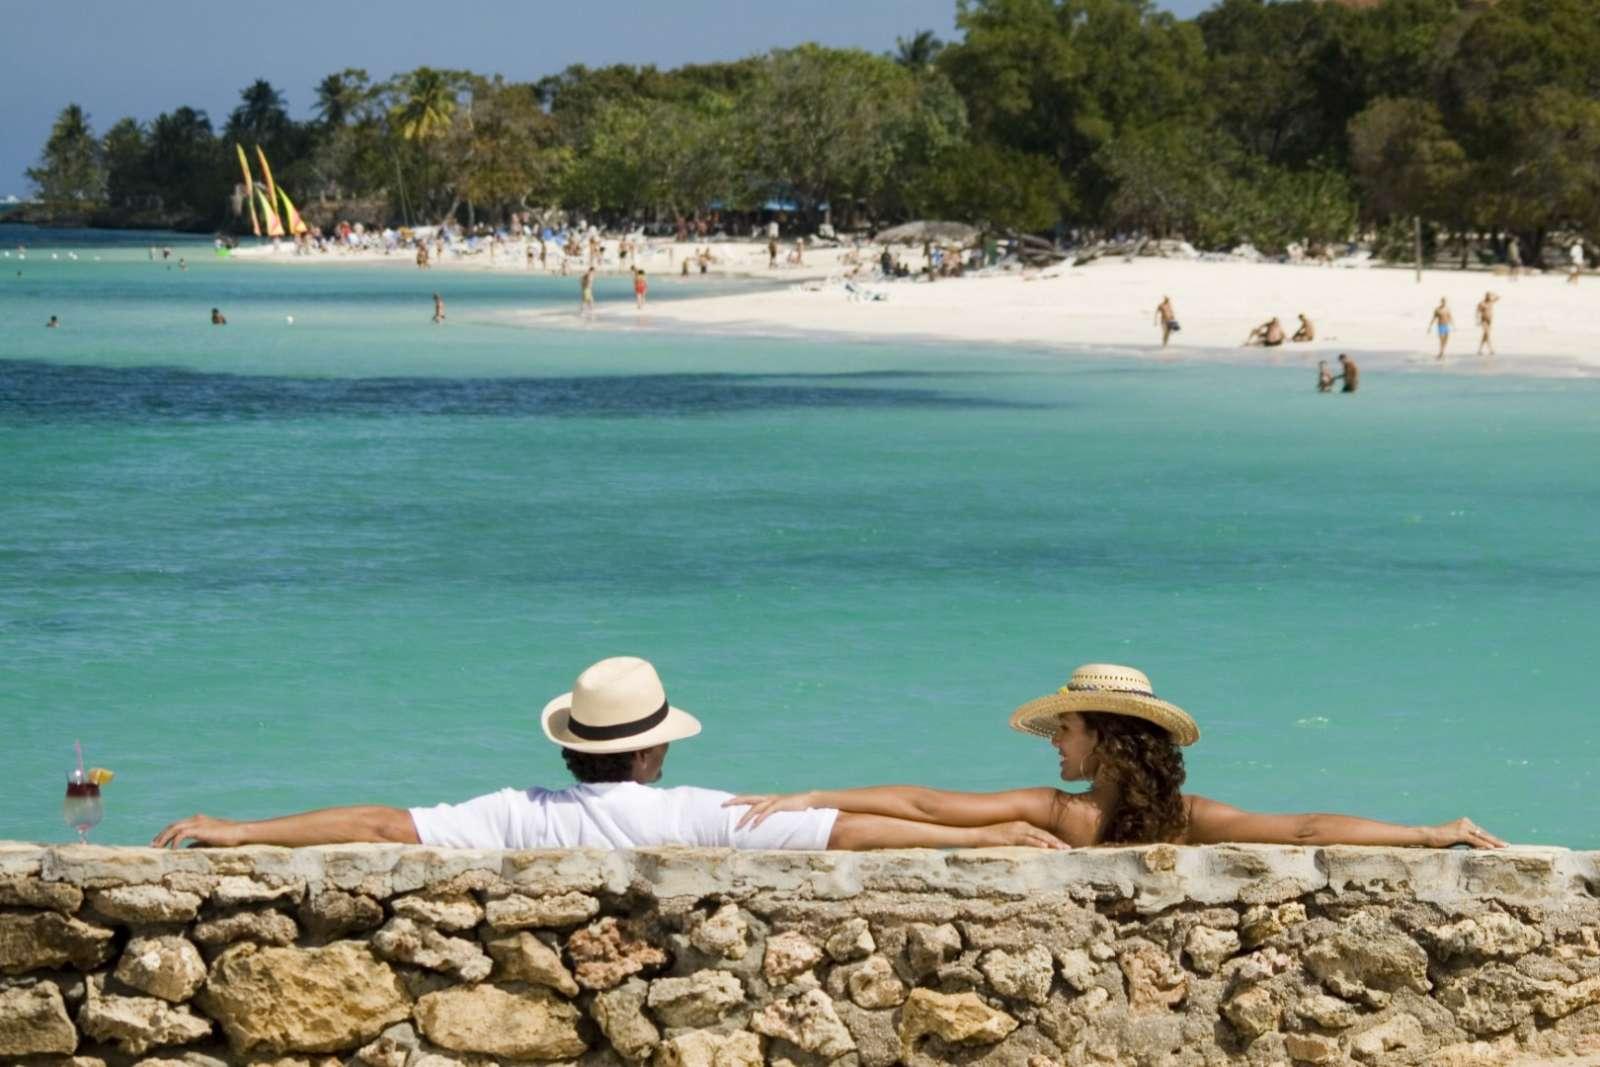 Couple overlooking a beach in Guardalavaca, Cuba